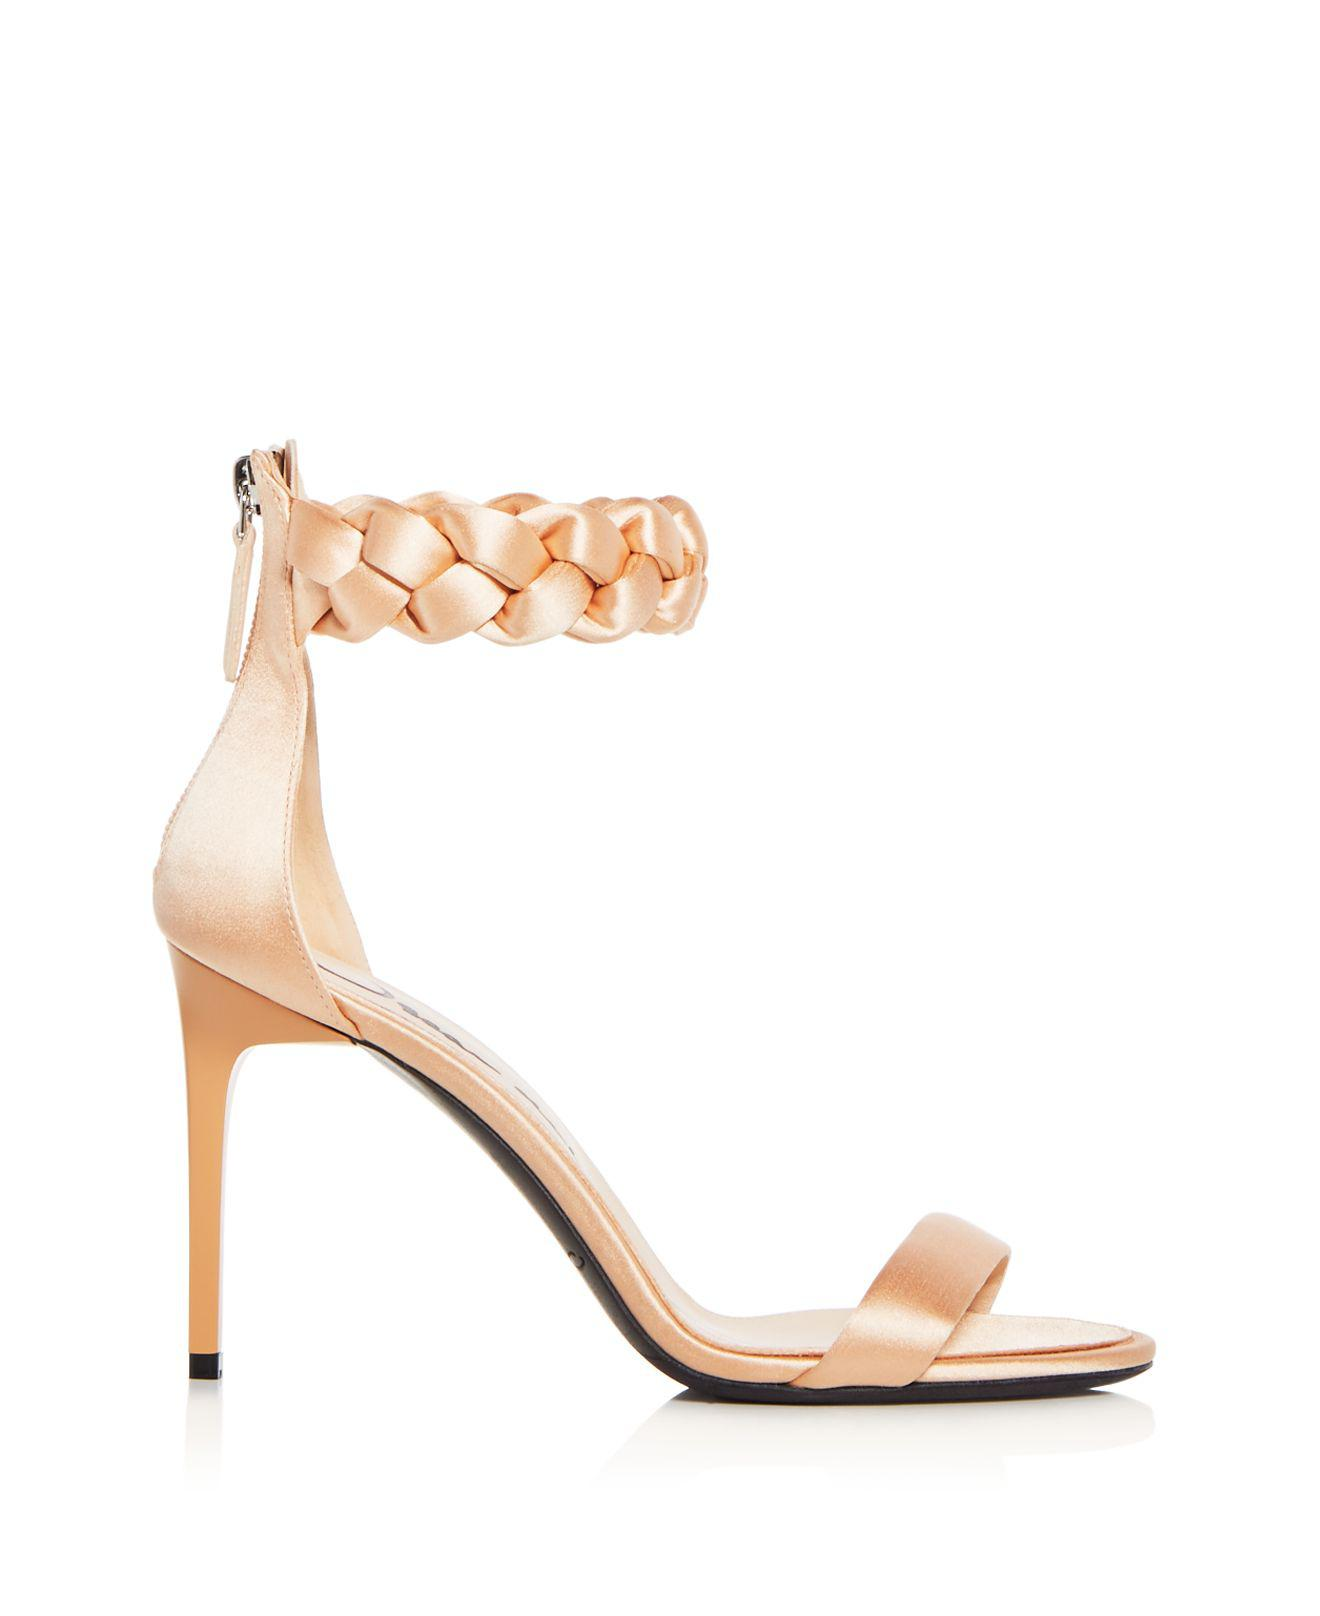 Oscar de la Renta Women's Brigit Braided Satin Ankle Strap High-Heel Sandals UV1RuC7xe